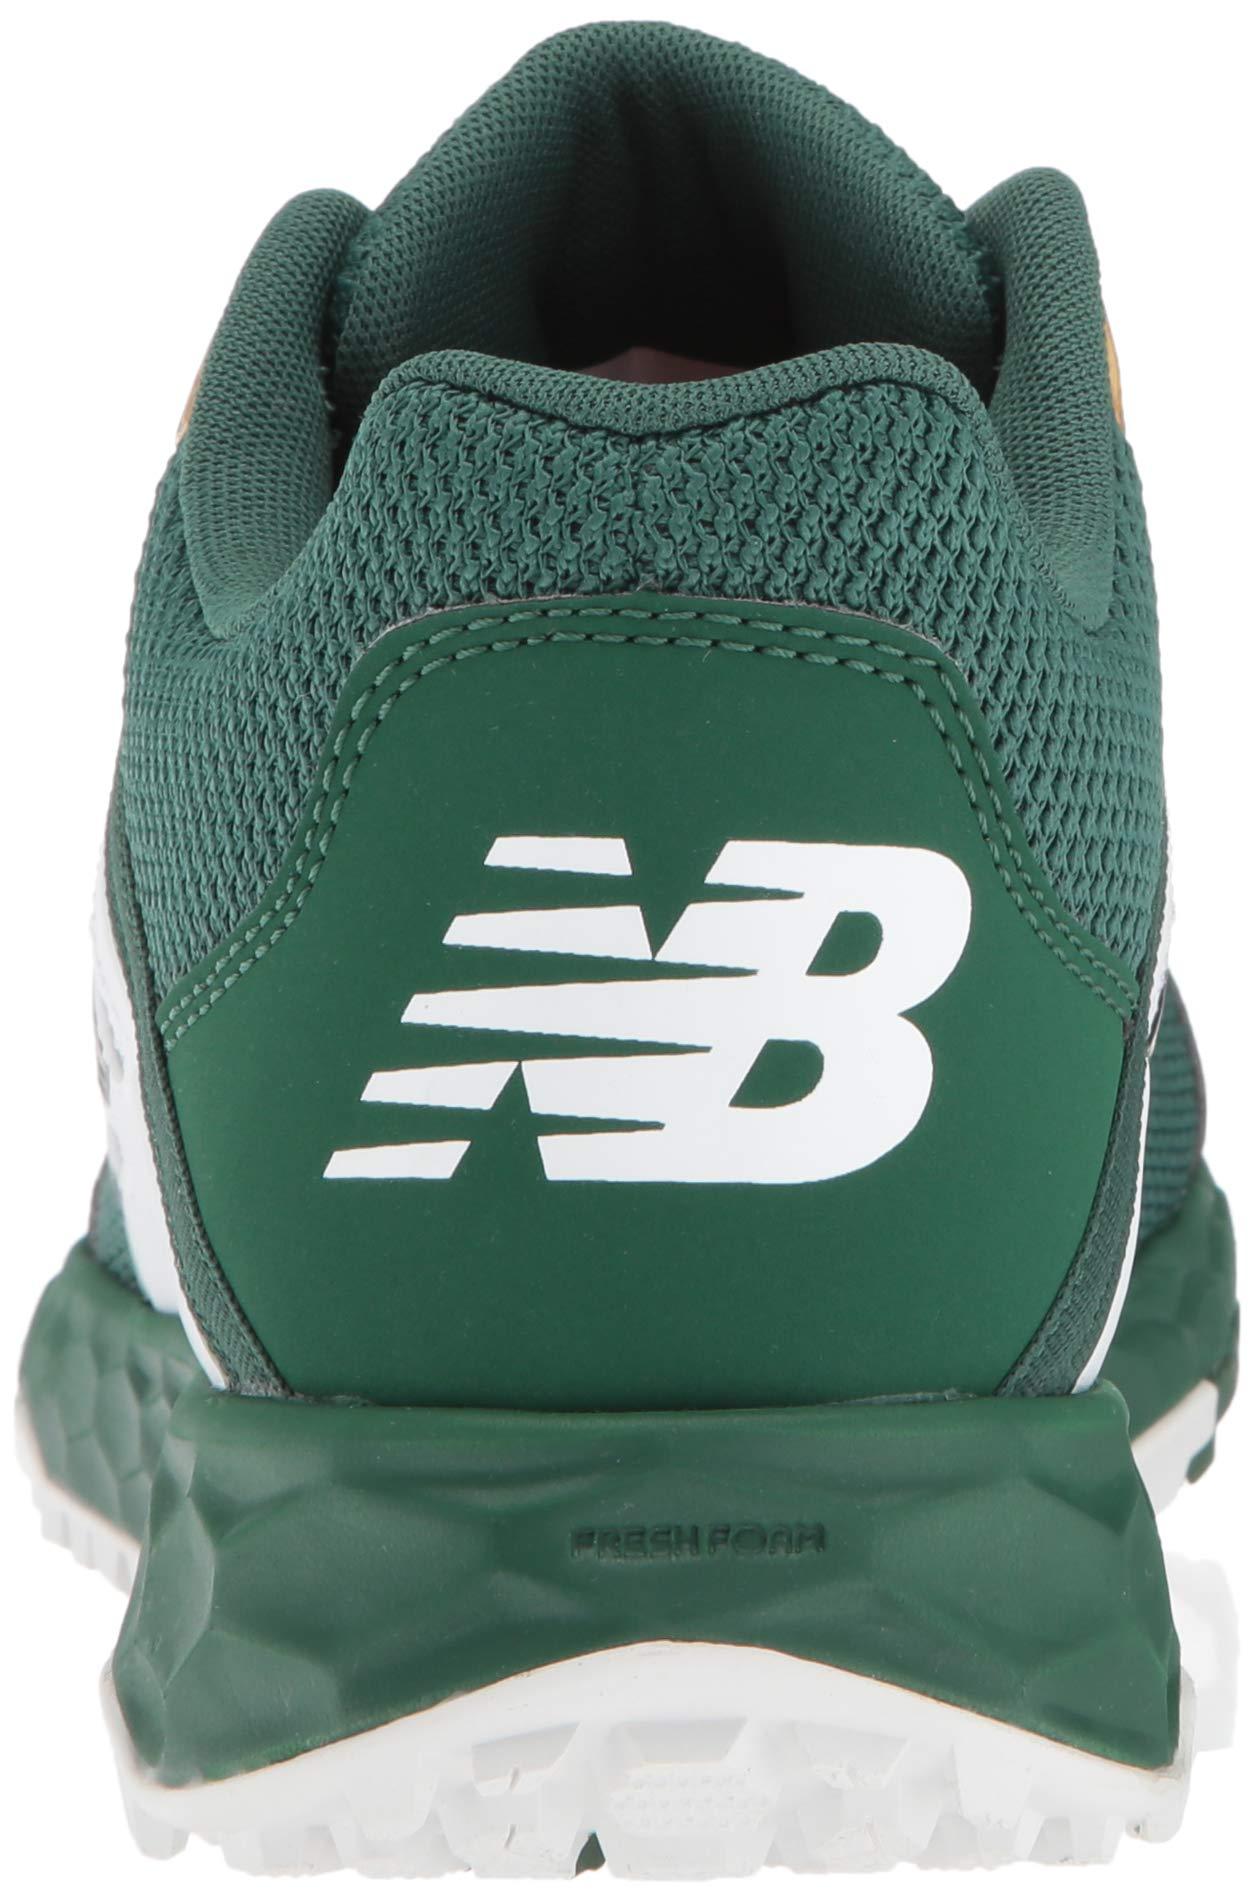 New Balance Men's 3000v4 Turf Baseball Shoe, Green/White, 5 D US by New Balance (Image #2)